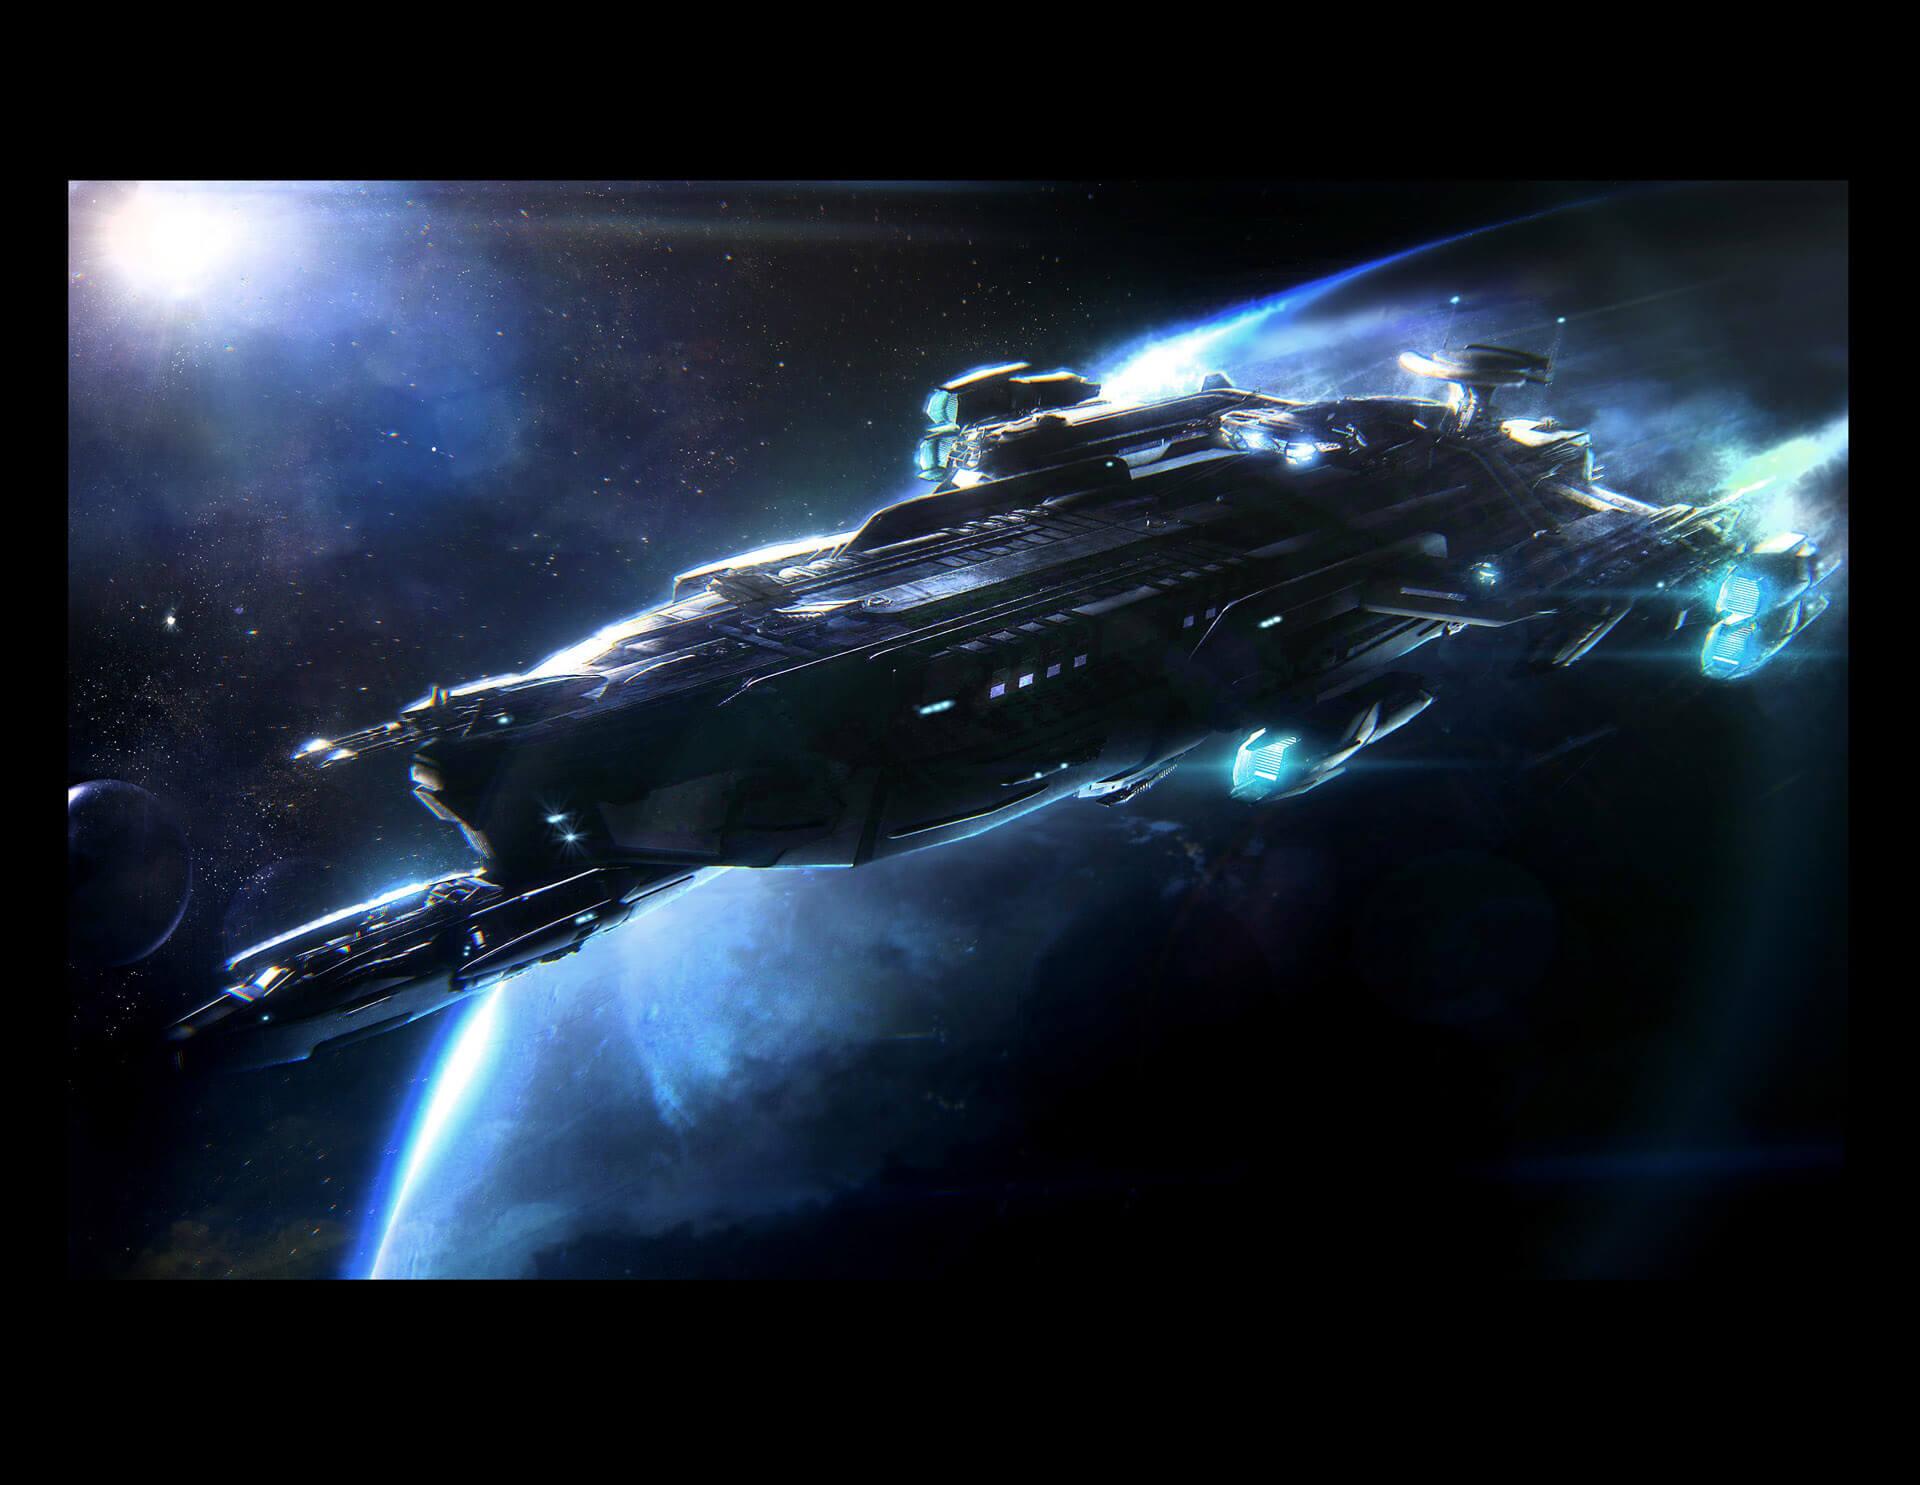 'Star Citizen' Crowdfunding Hits $41 Million; Will Still Support Oculus Rift